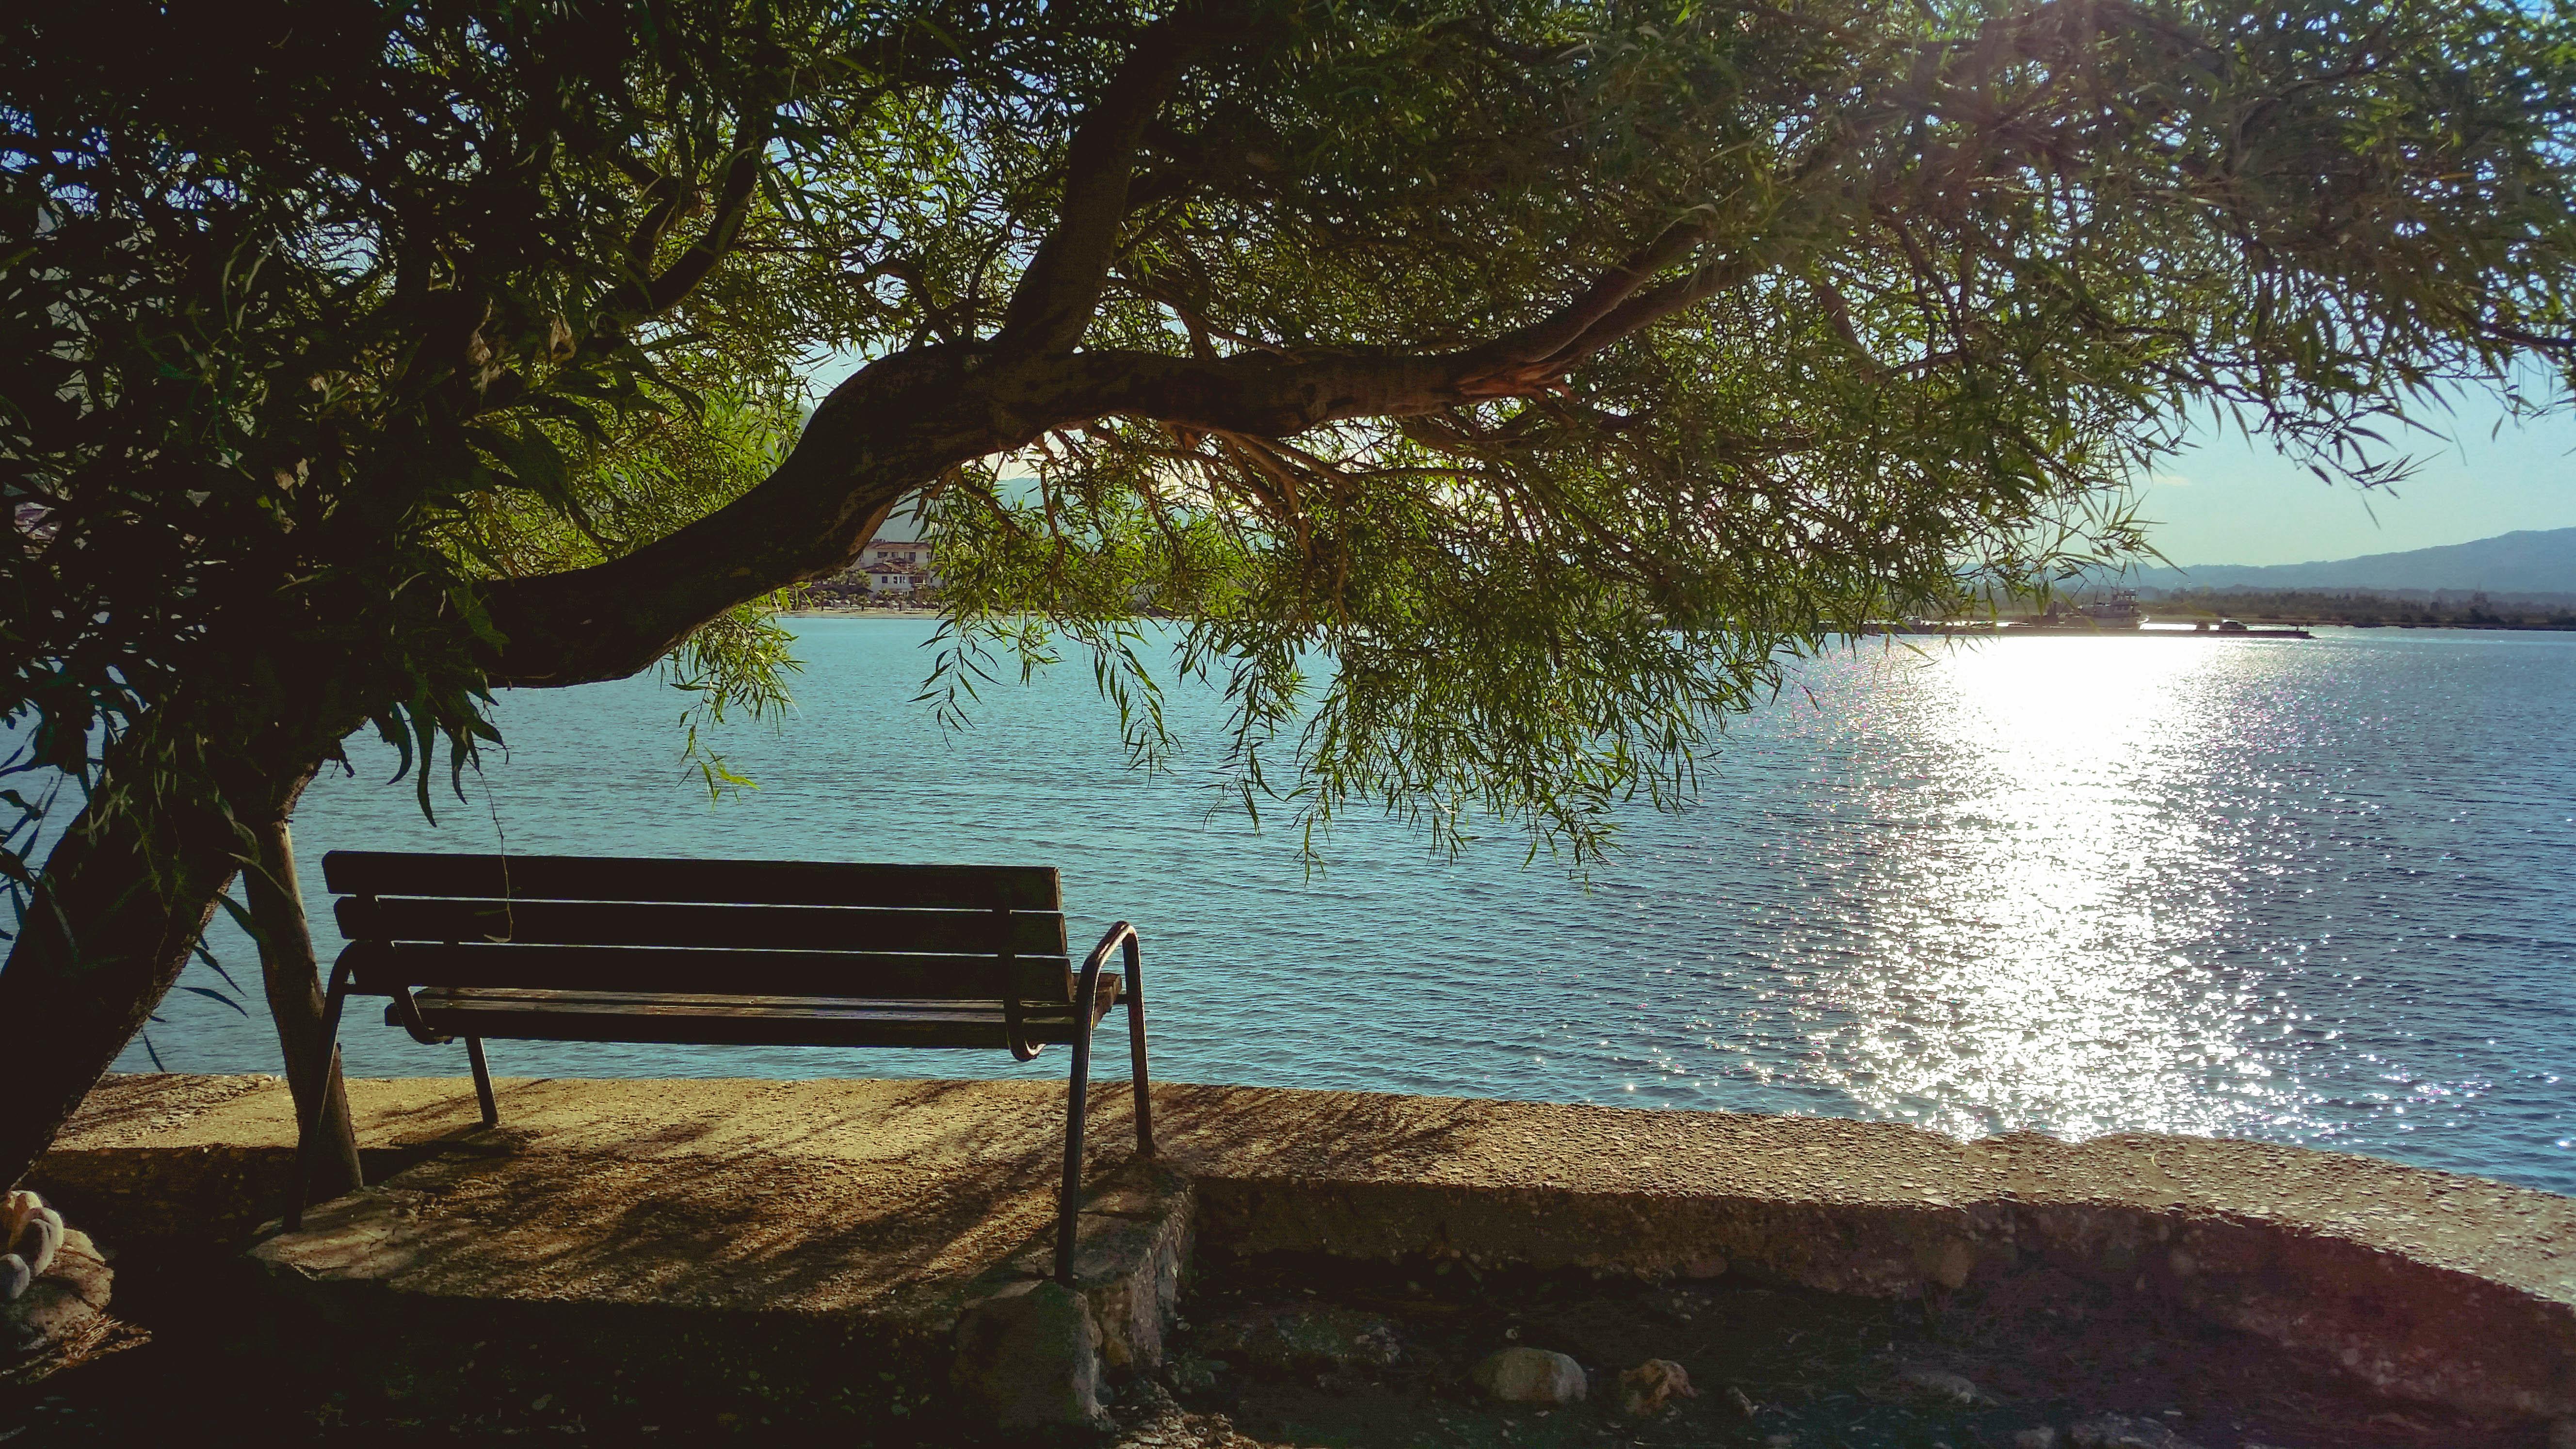 गंगा नदी पर निबंध / Essay on River Ganga in Hindi